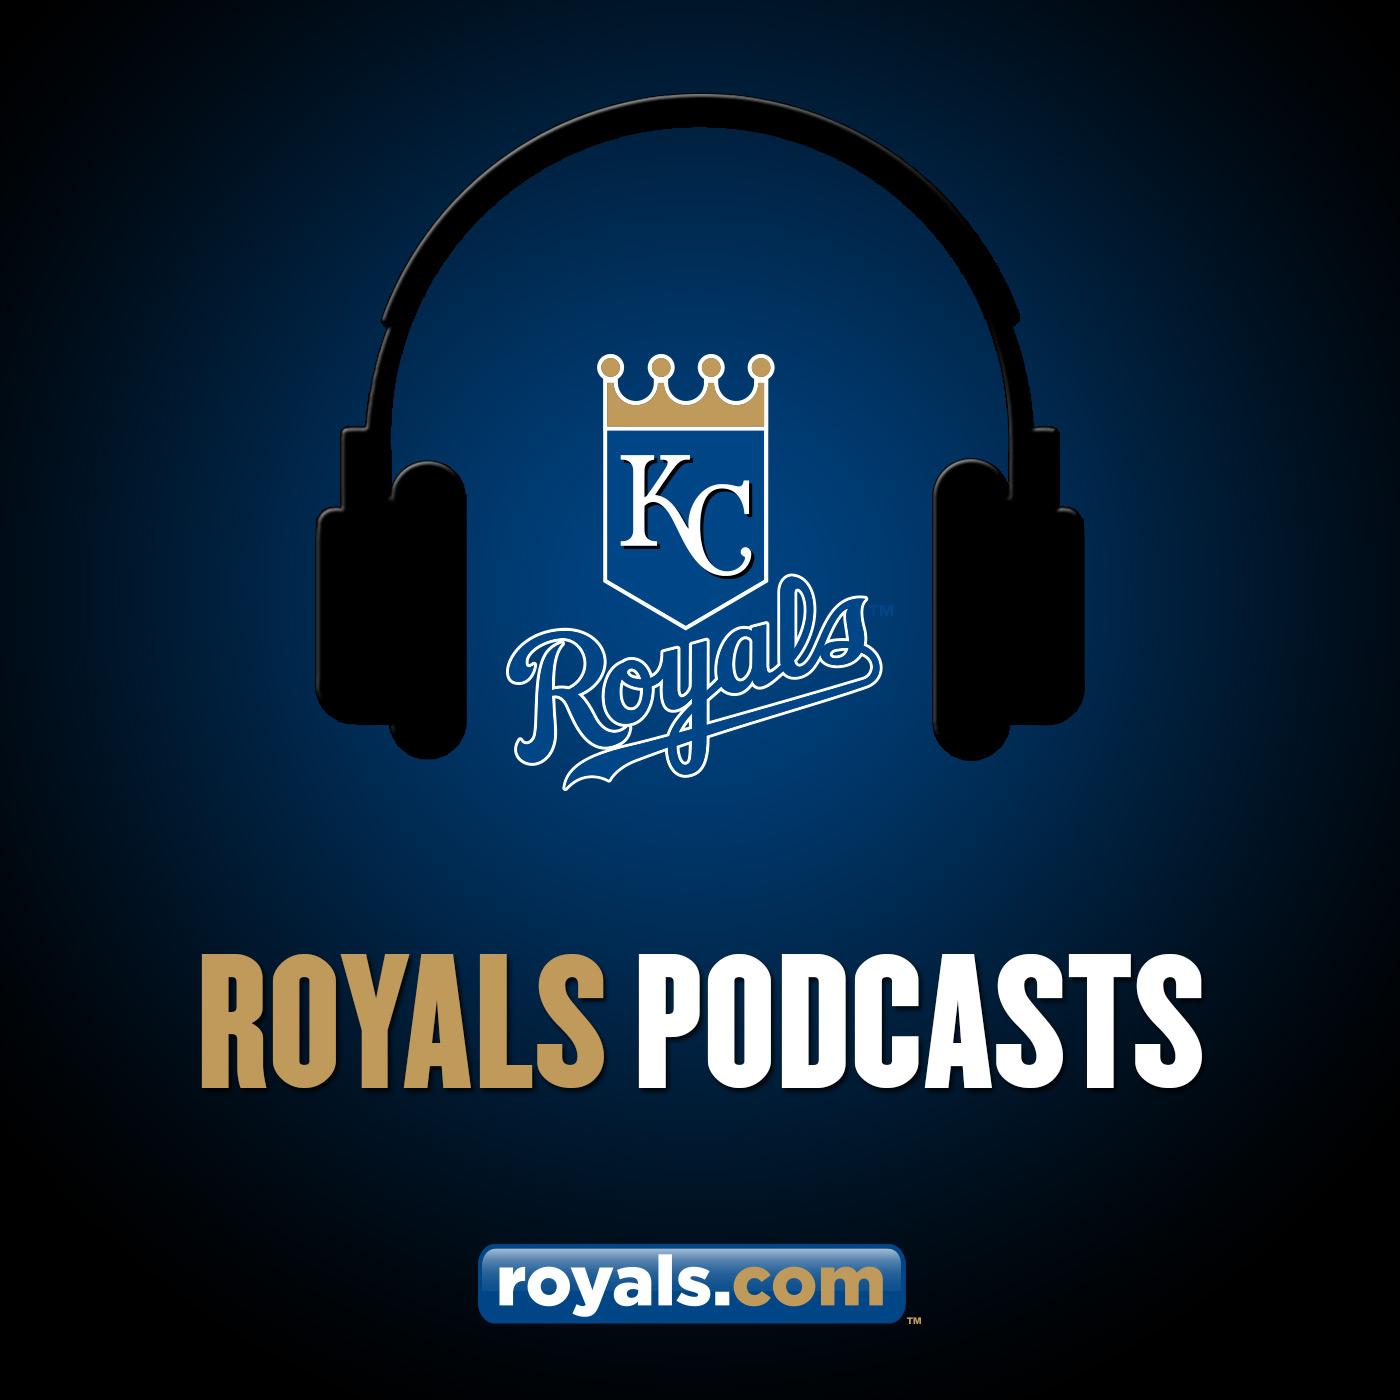 <![CDATA[Kansas City Royals Podcast]]>